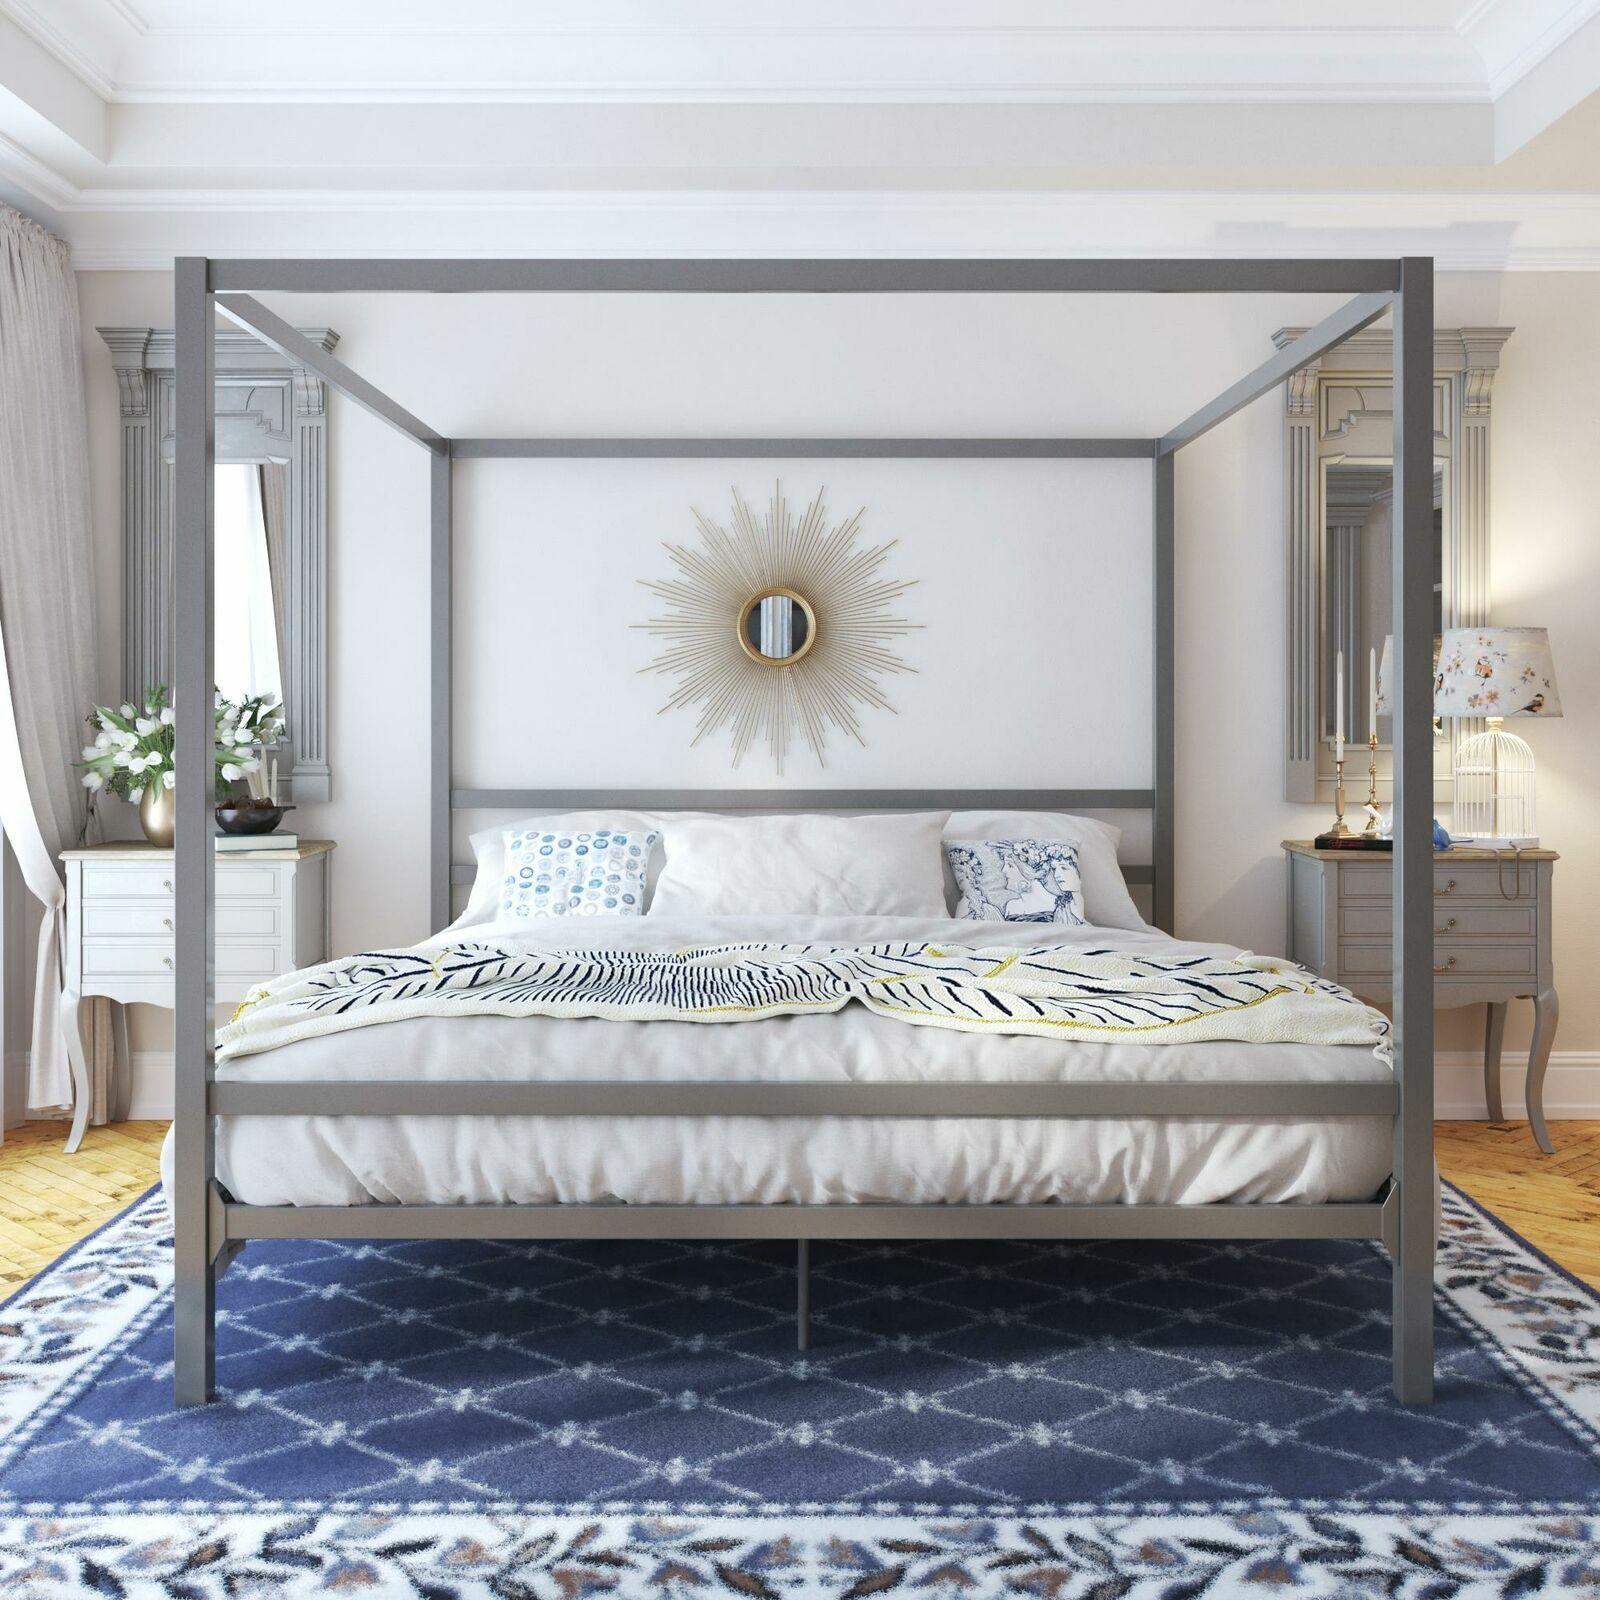 Bed Upholstered Frame Super King Size 180 X 200 High Headboard